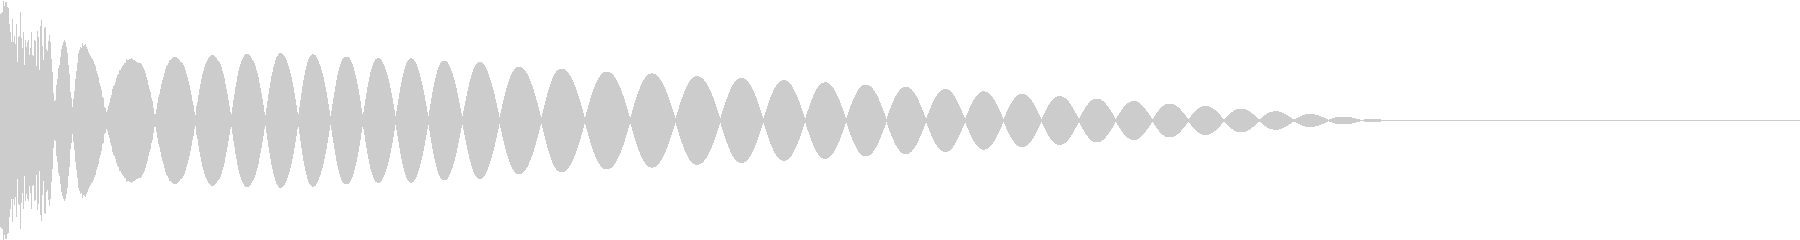 DTM Kick 13 オリジナル音源の未再生の波形